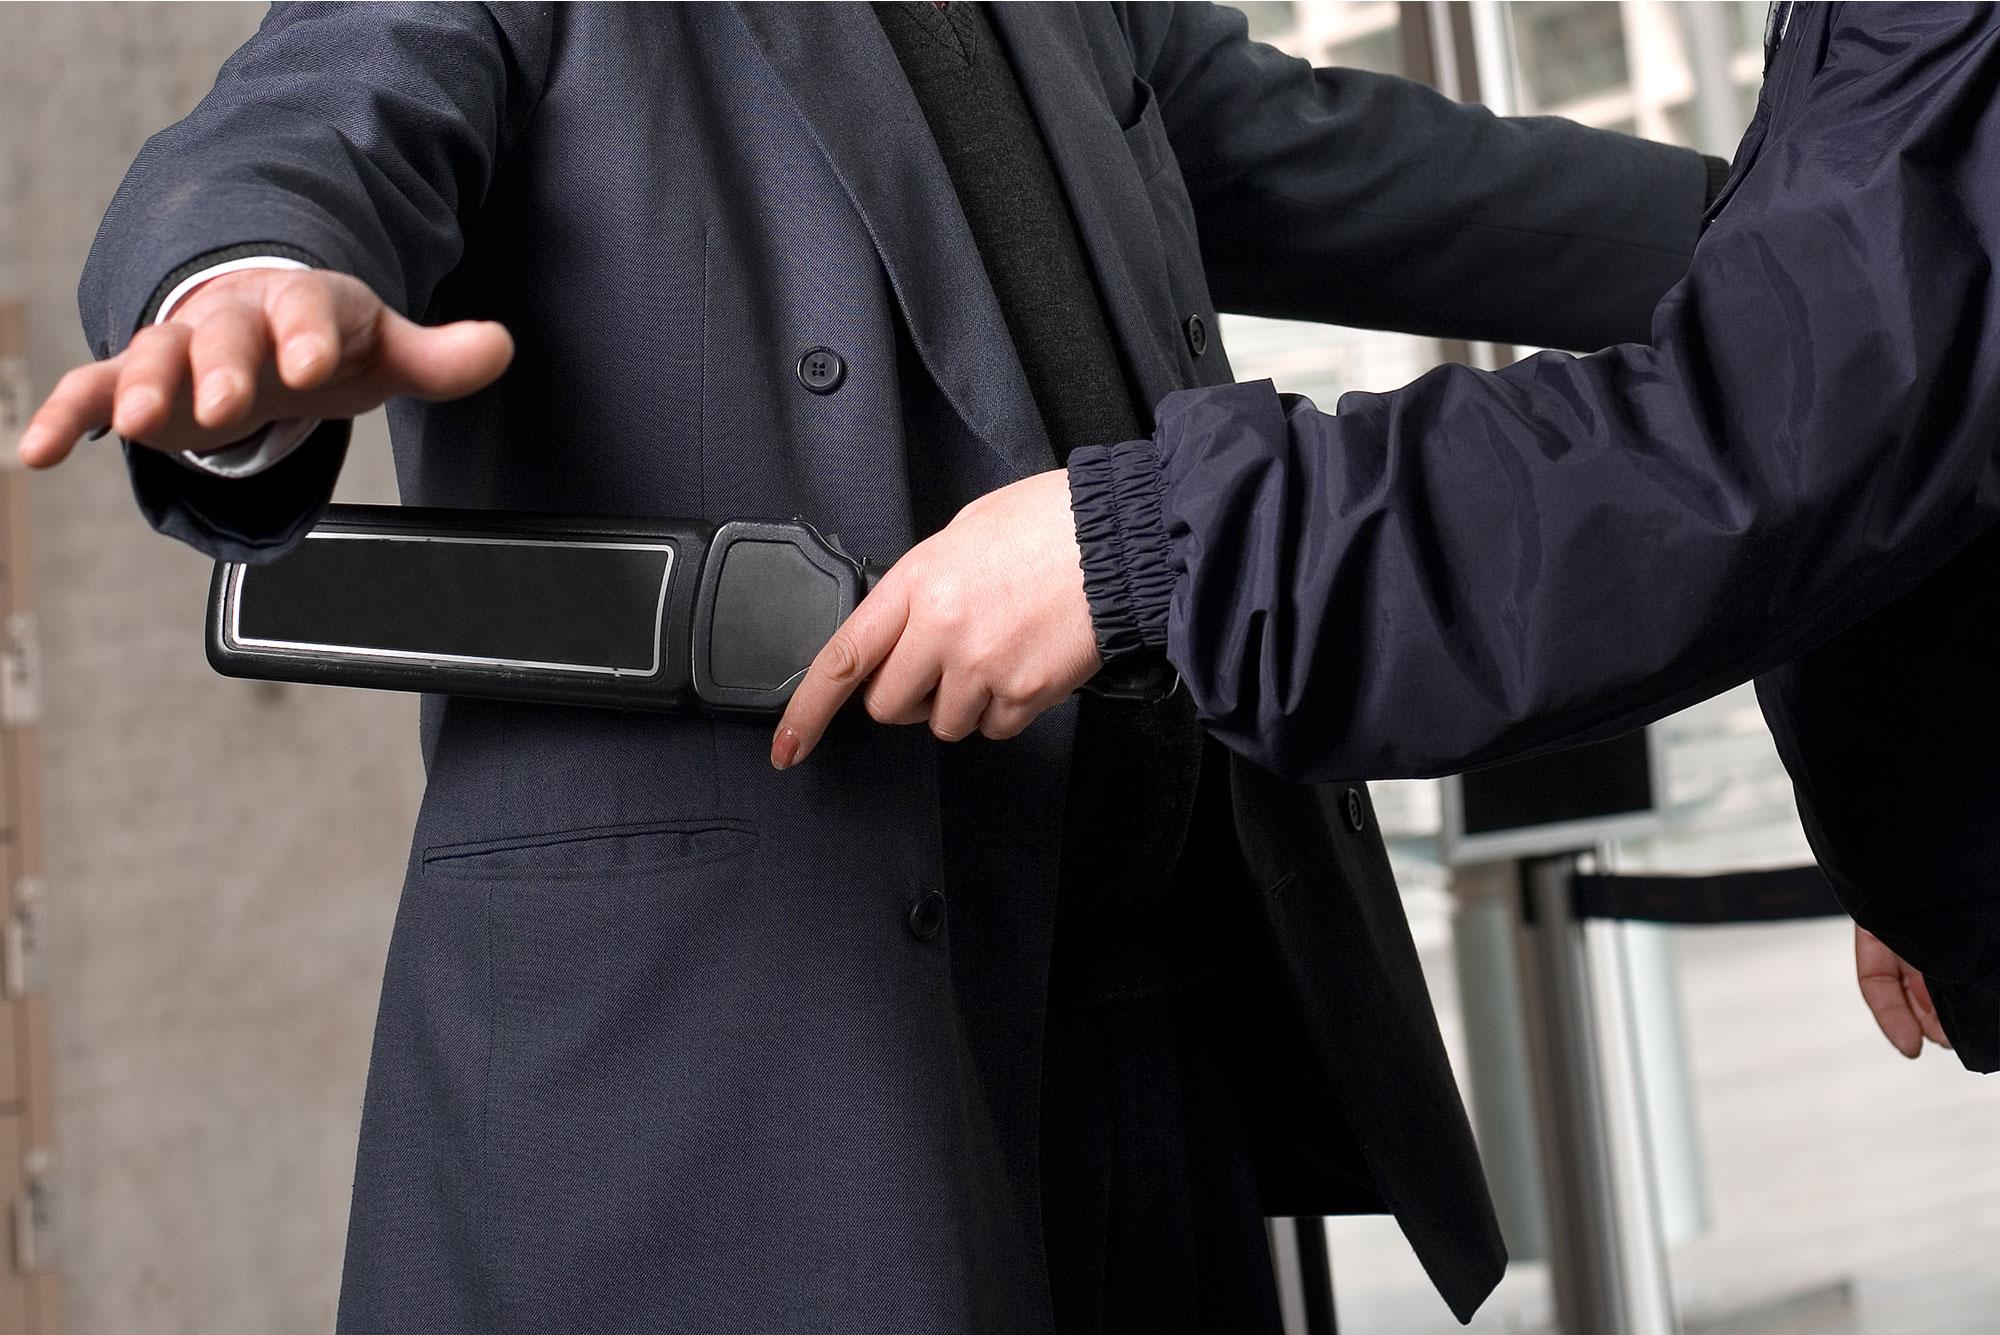 O empregador pode revistar seus empregados?